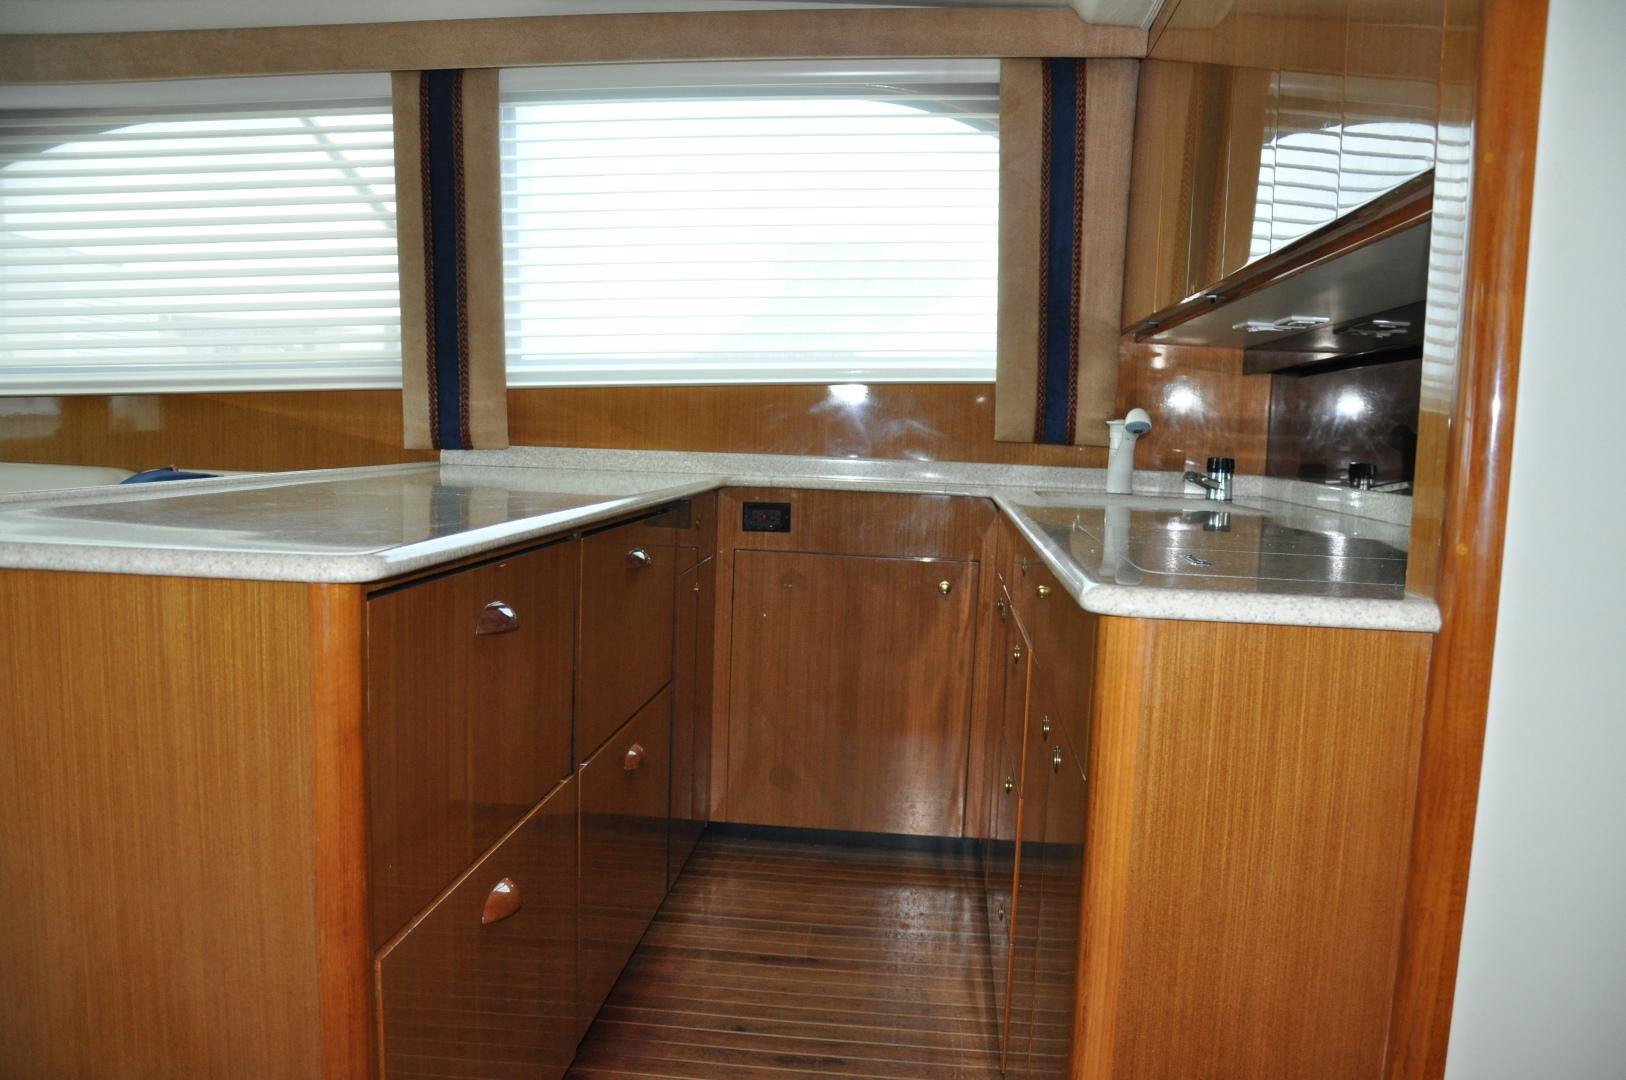 Viking-Convertible 2003-Reel Cowboy Deerfield Beach-Florida-United States-Galley-1546870 | Thumbnail